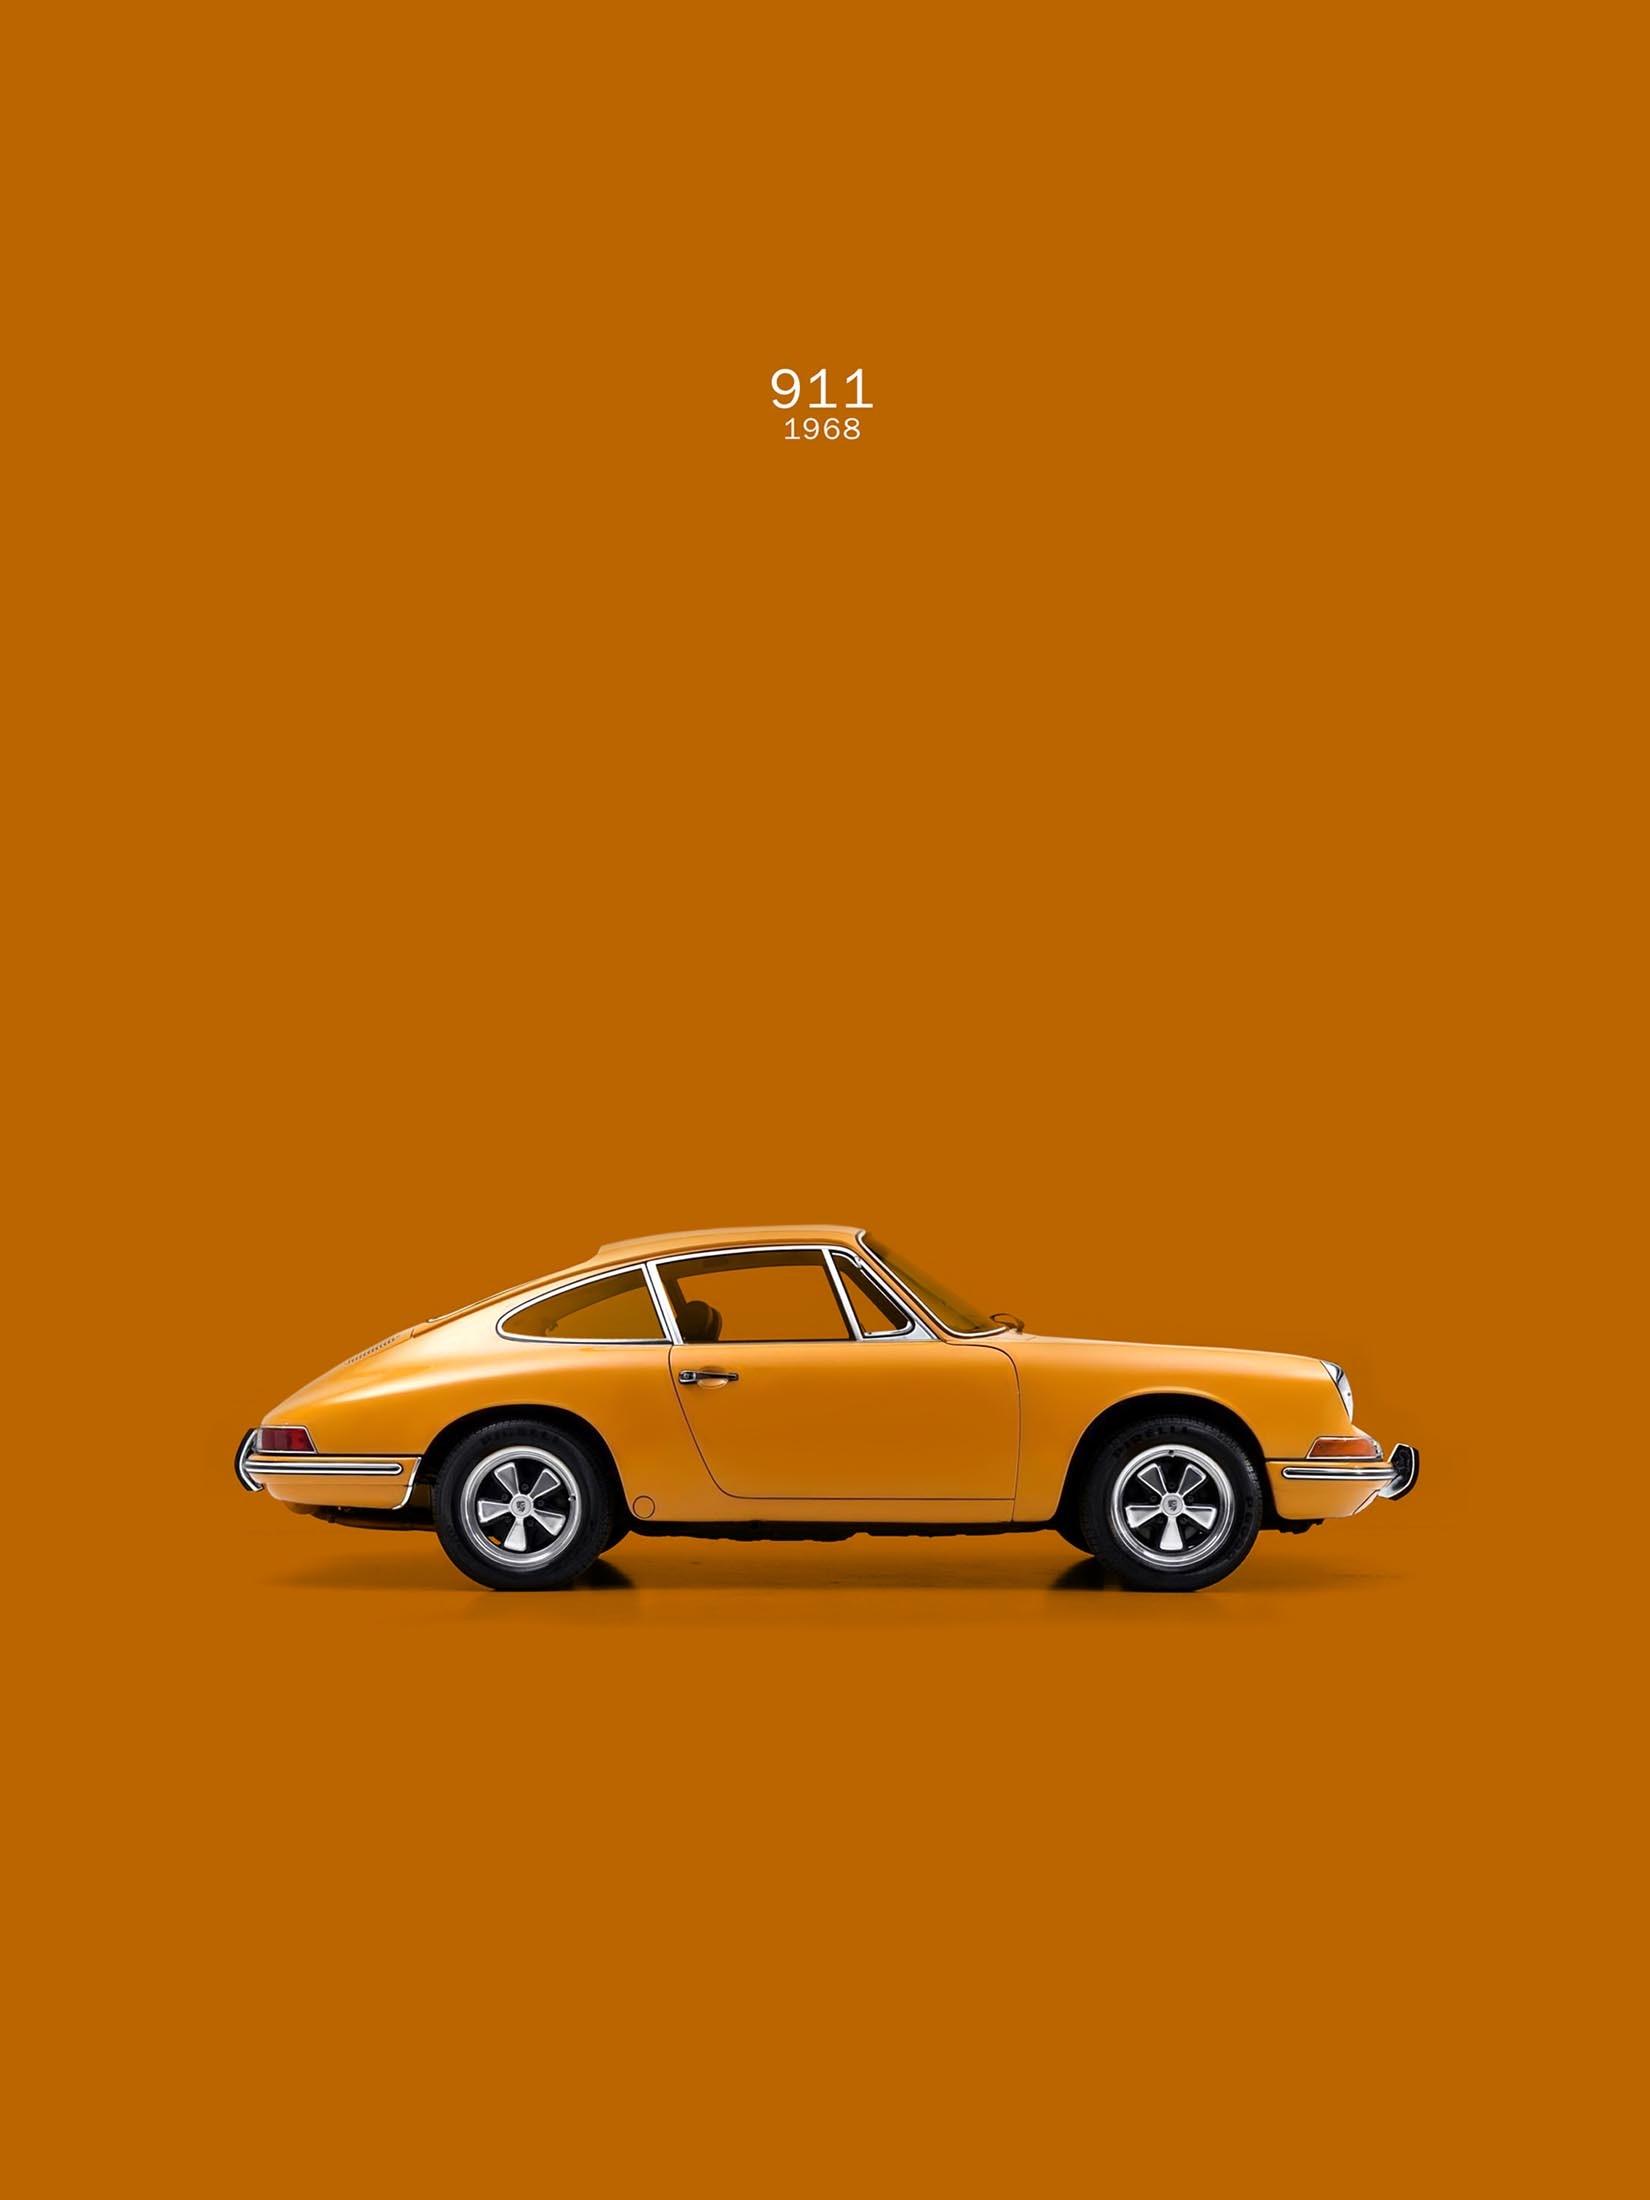 911 1968